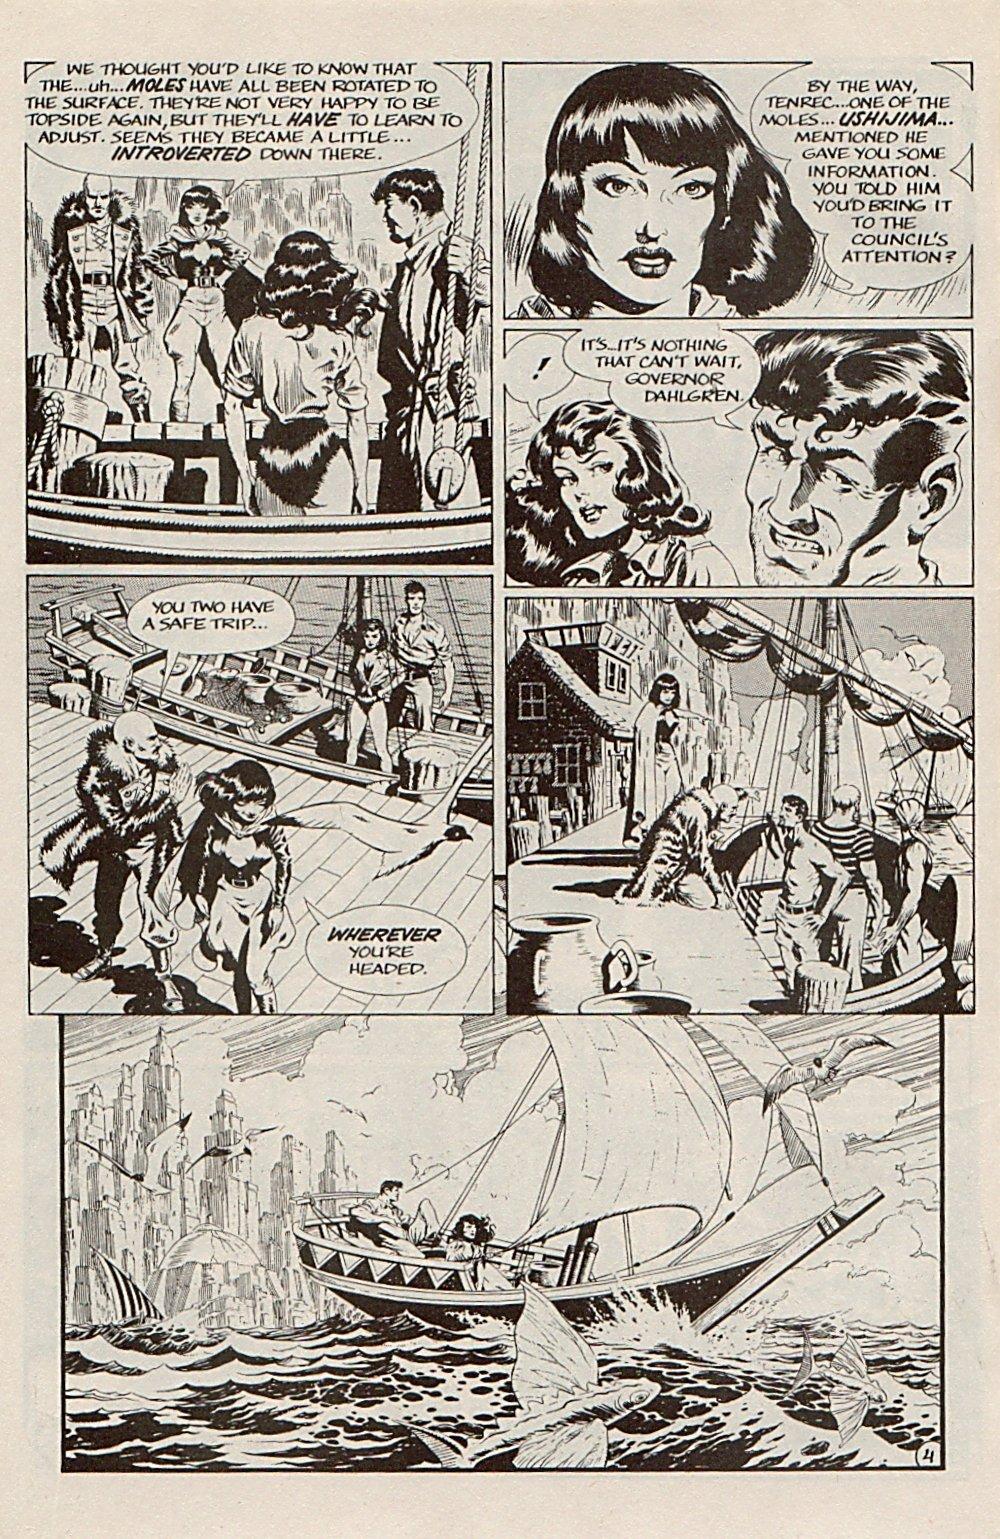 Read online Xenozoic Tales comic -  Issue #5 - 7